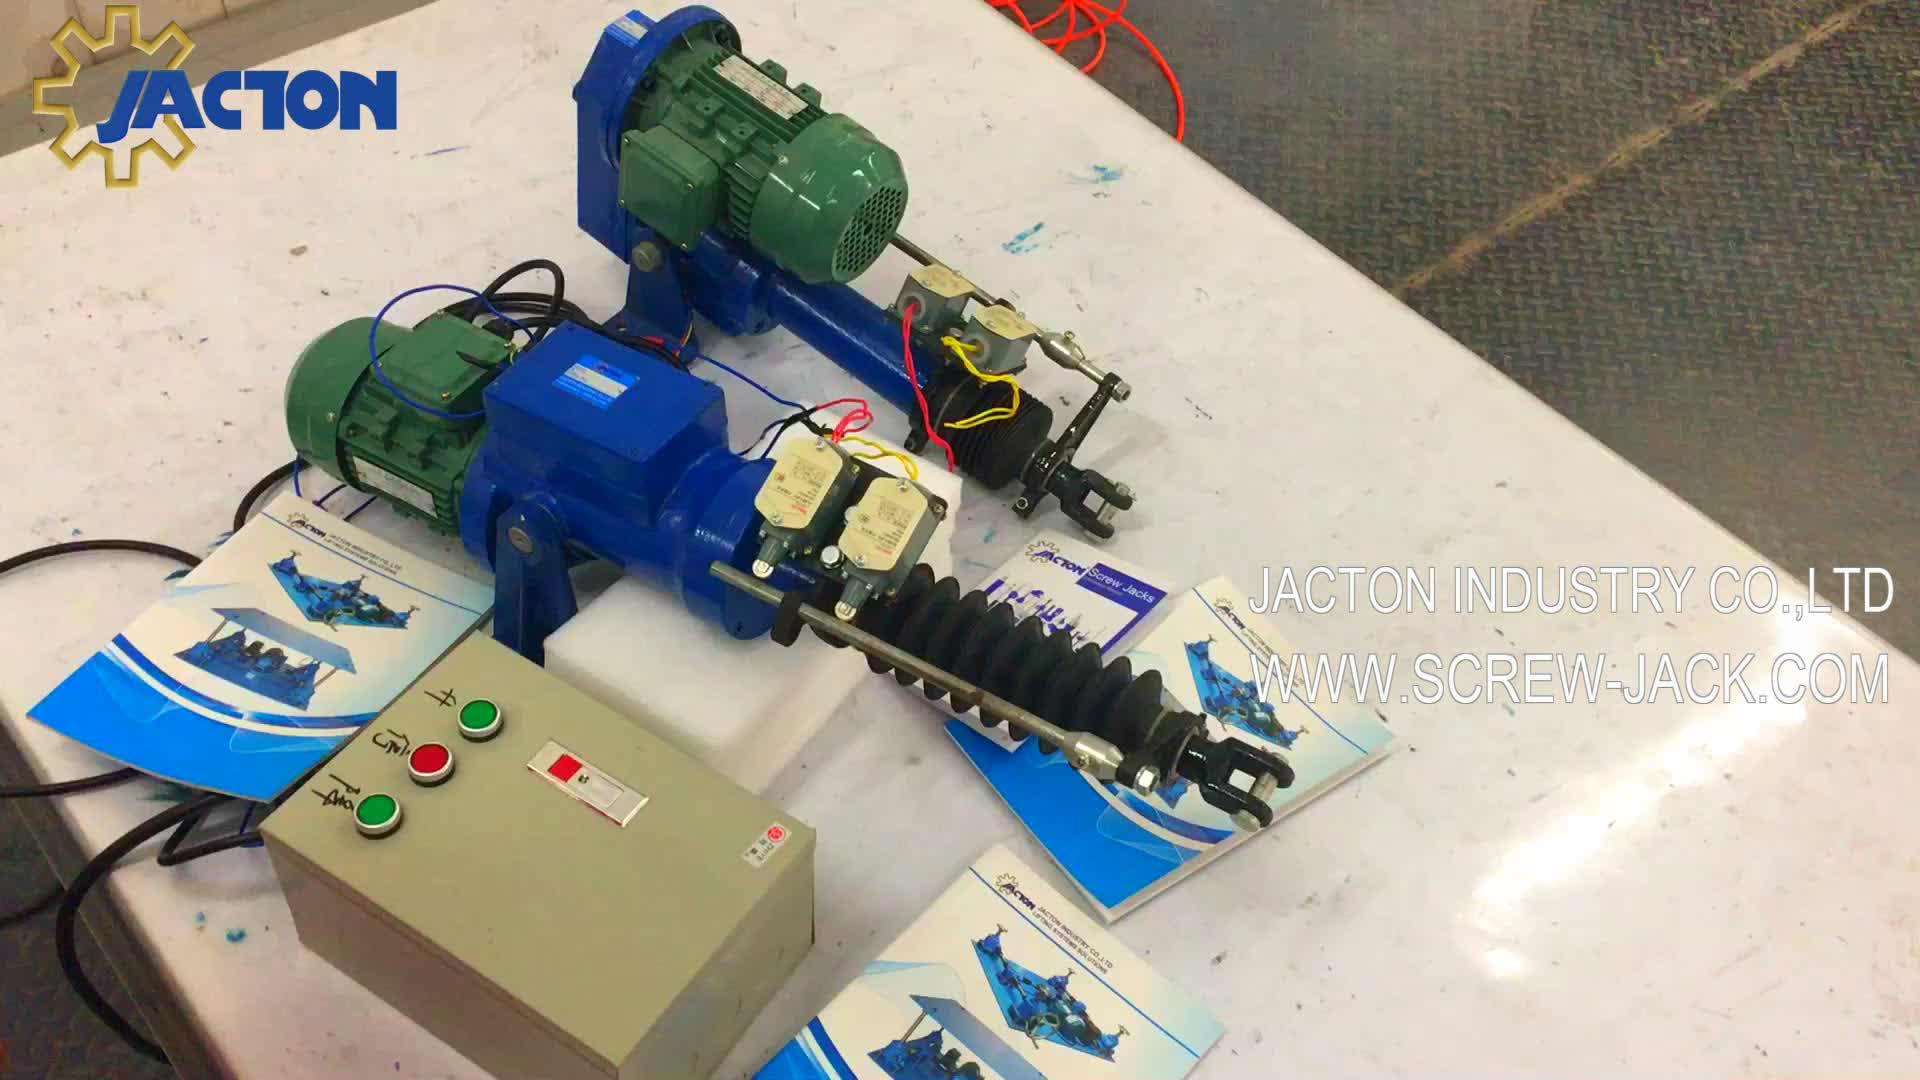 1000Kgf ความจุ Electric Linear Actuator มอเตอร์ไดรฟ์น้ำหนัก Motor - Driven Actuator